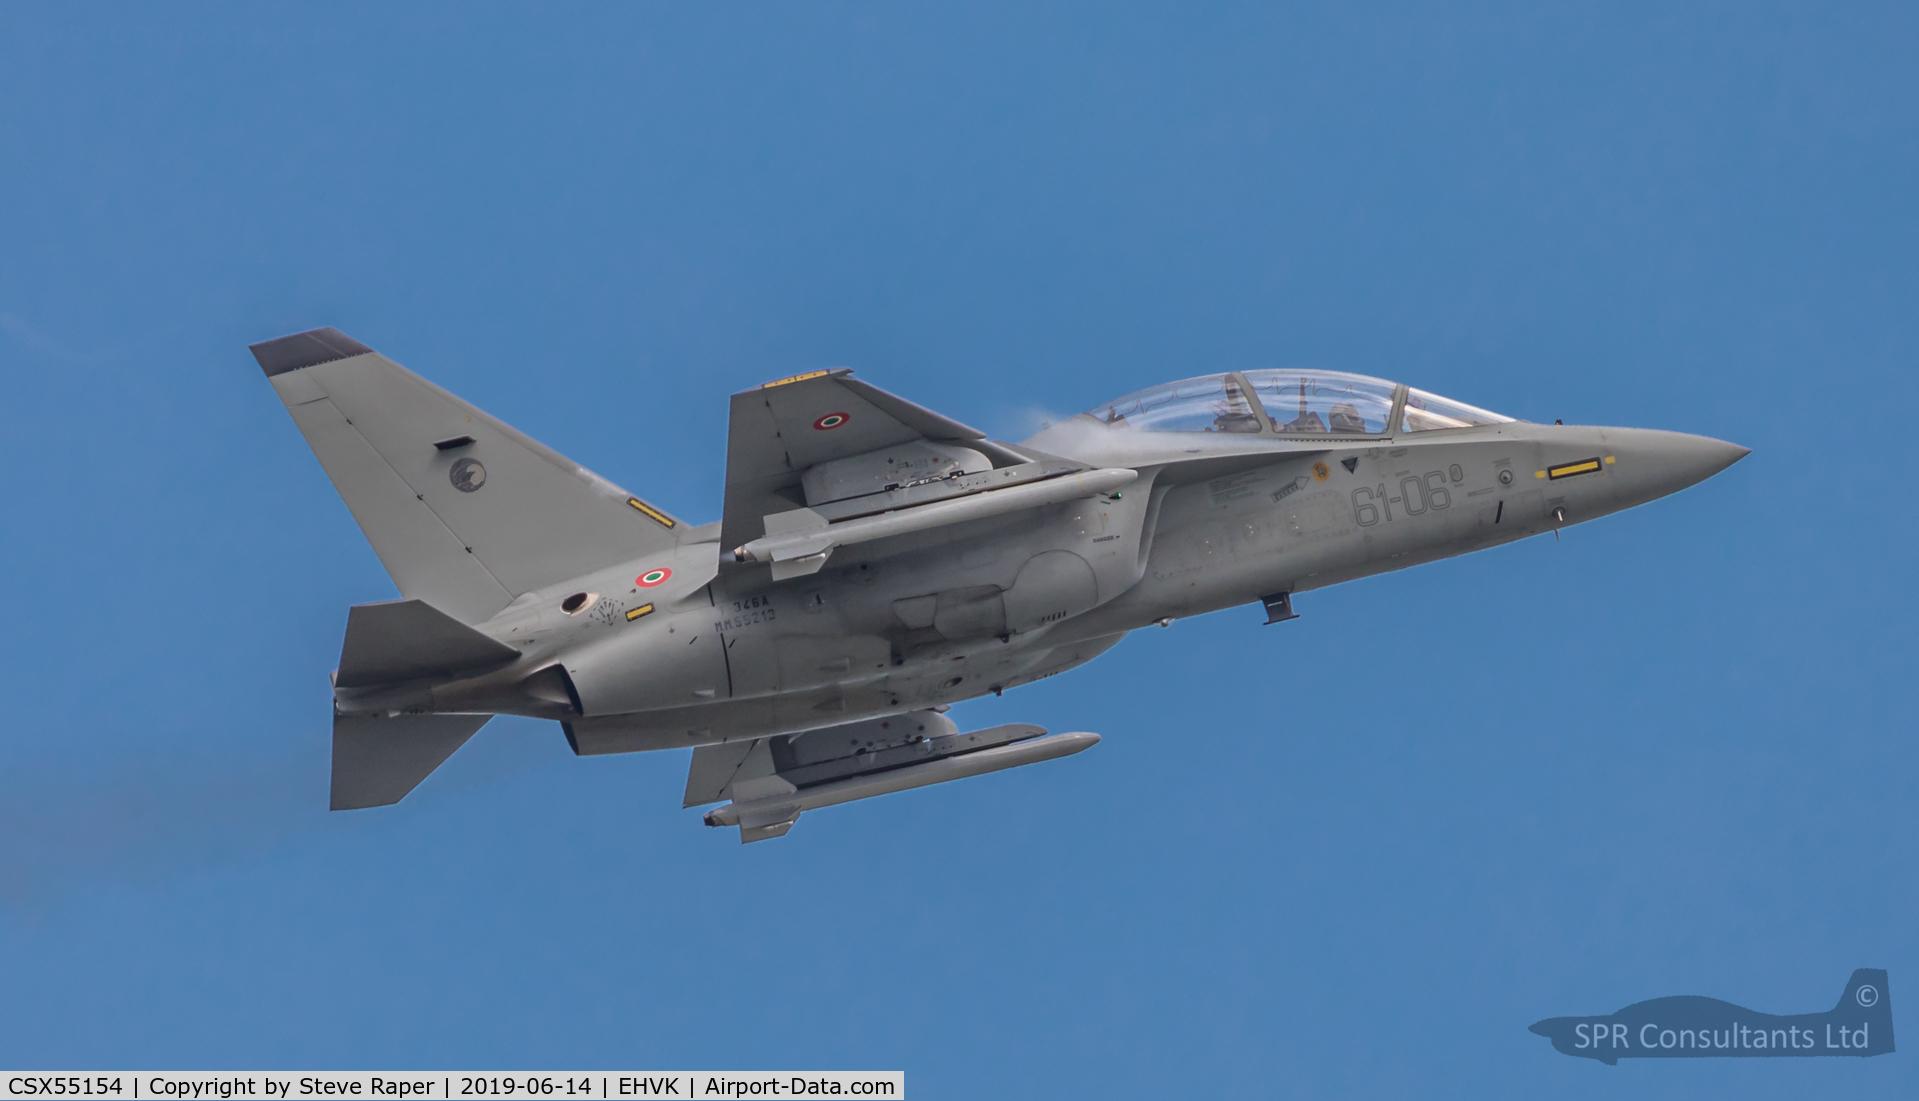 CSX55154, Alenia Aermacchi T-346A Master C/N Not found CSX55154/MM55154, Royal Netherlands Air Force Base Volkel air day 14 June 2019